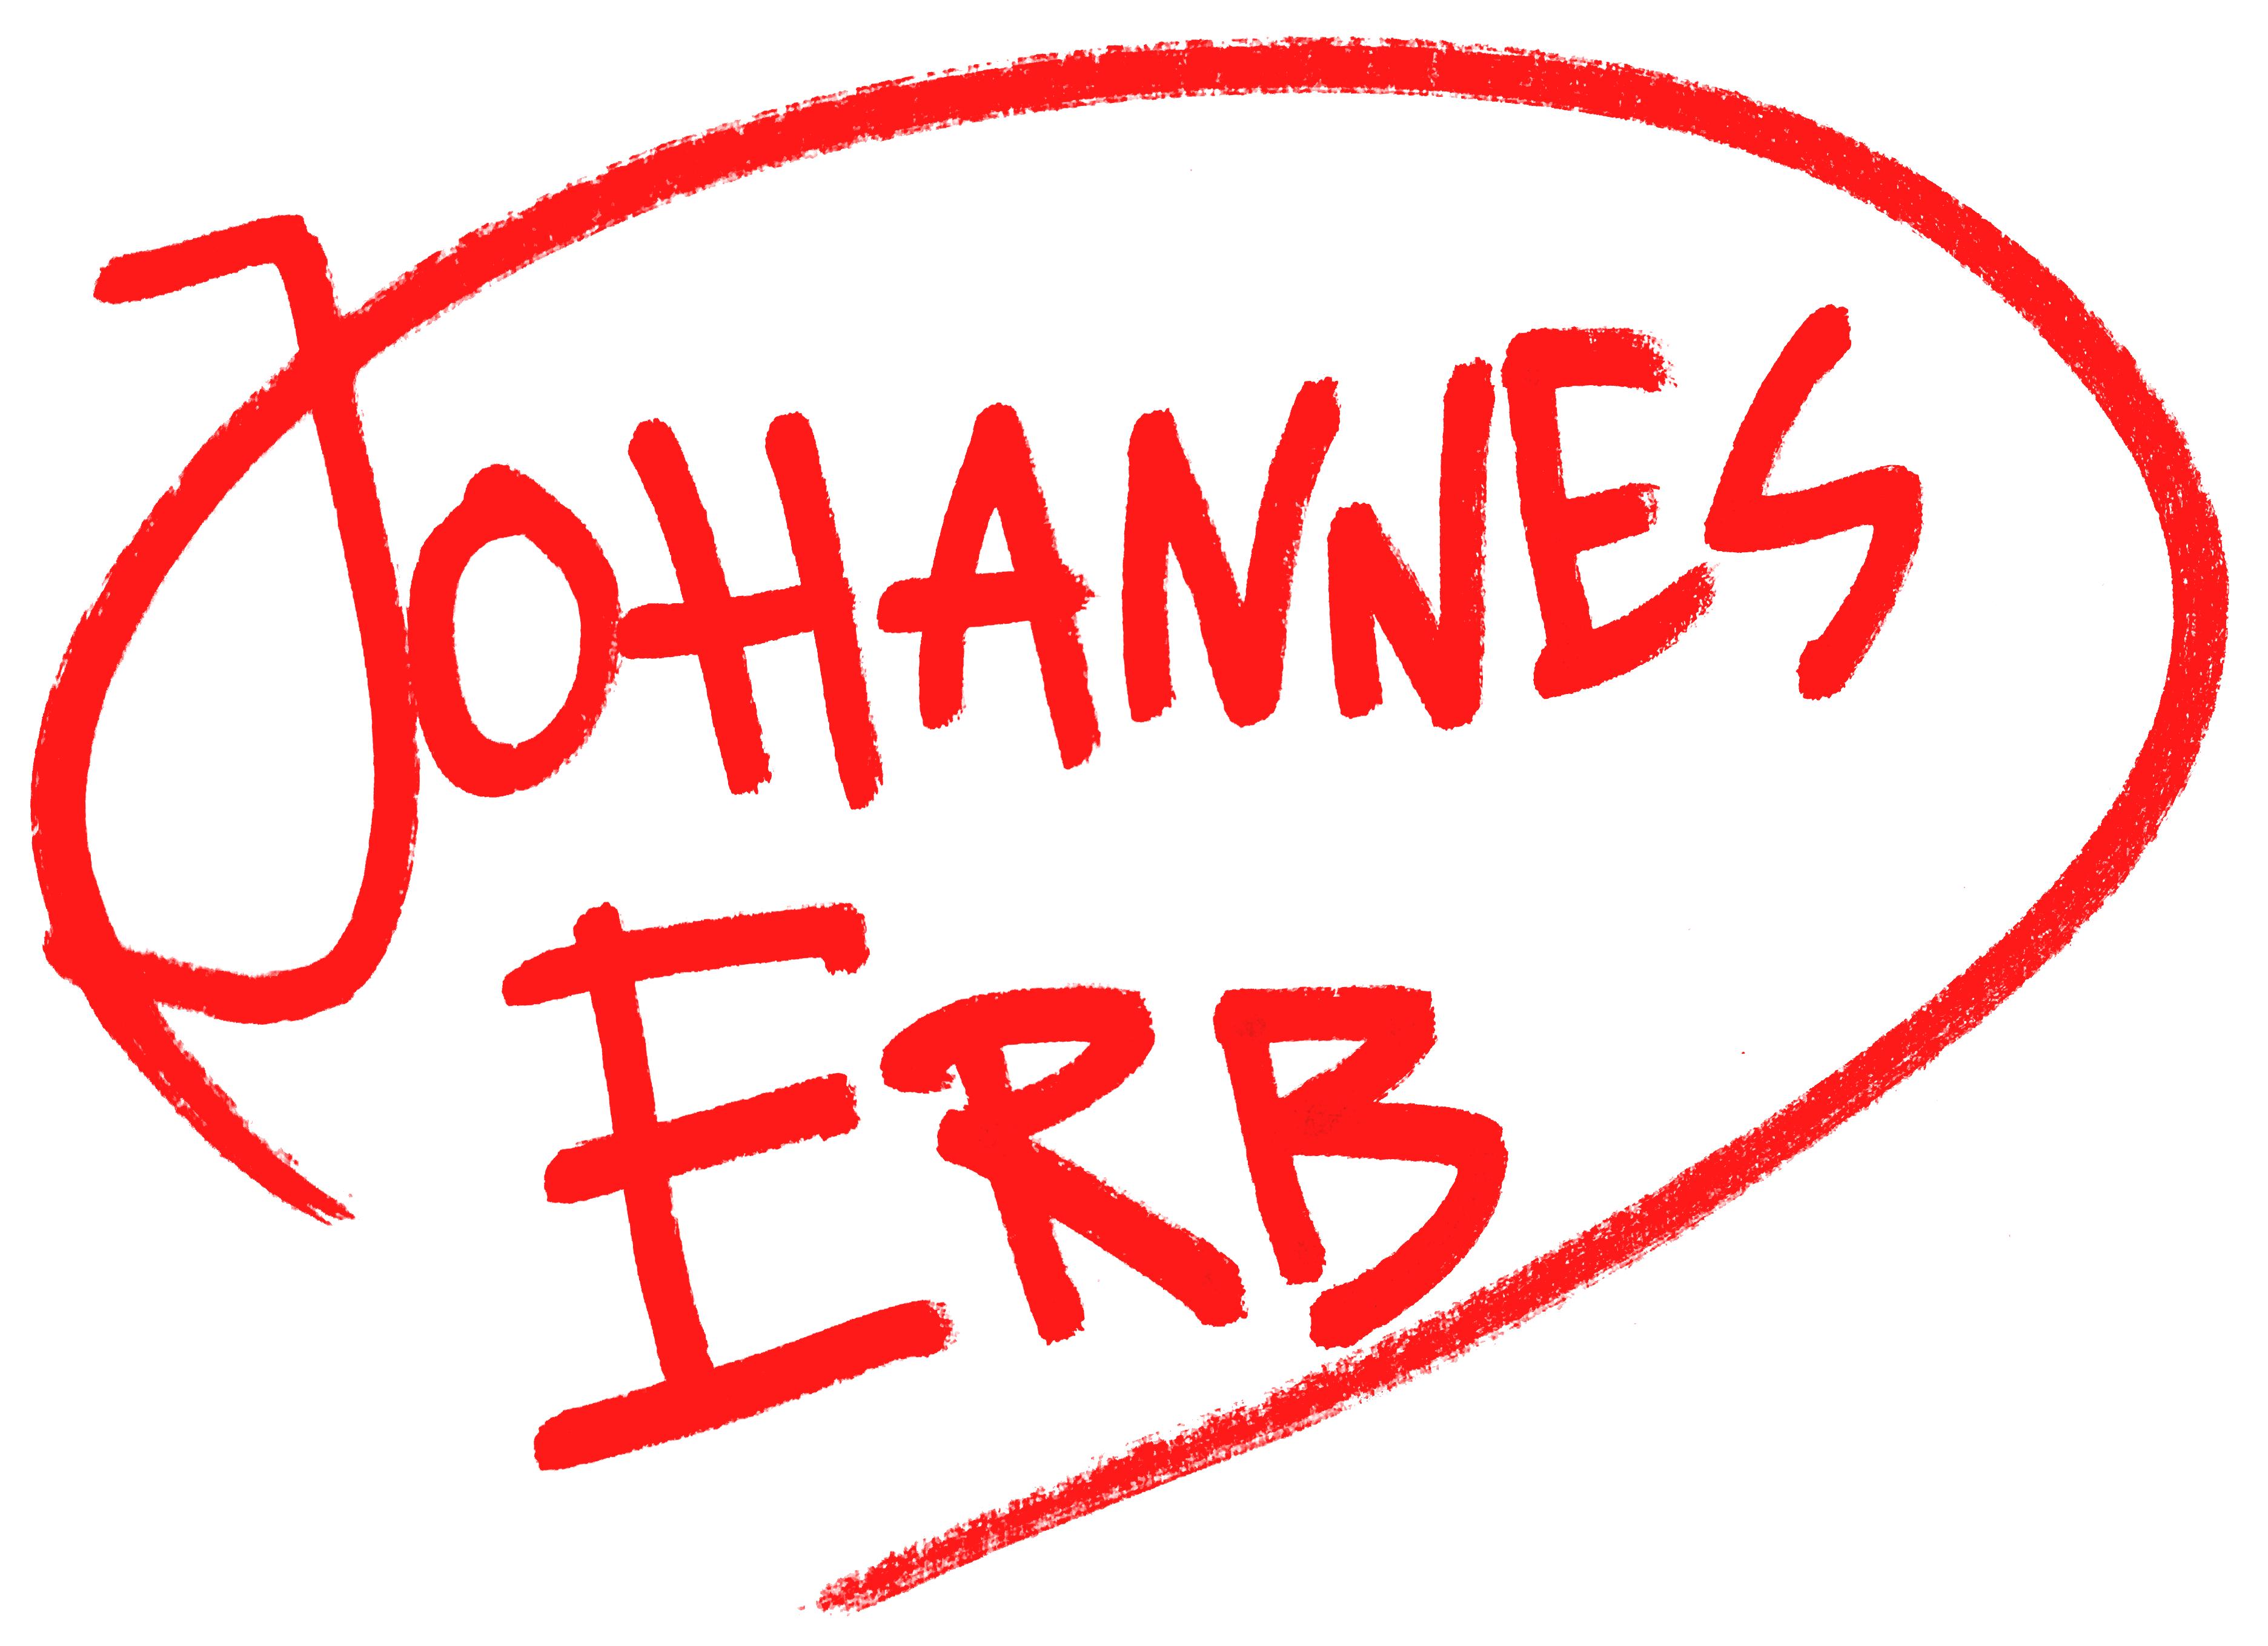 Johannes Erb